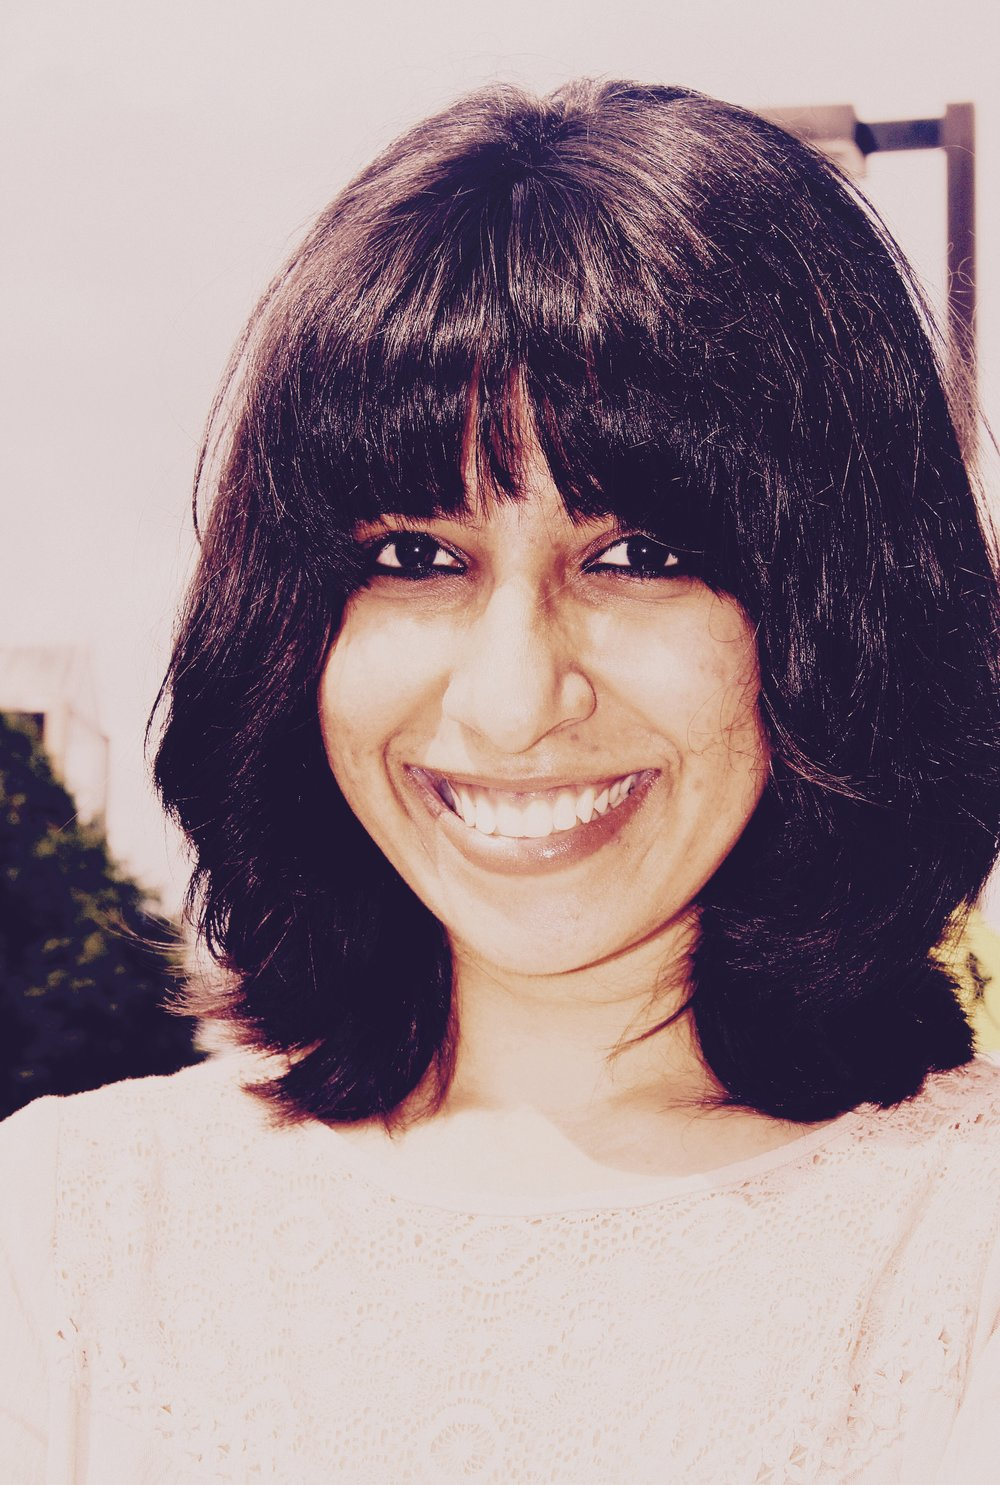 Pavitra Krishnaswami BS Bio - Technician